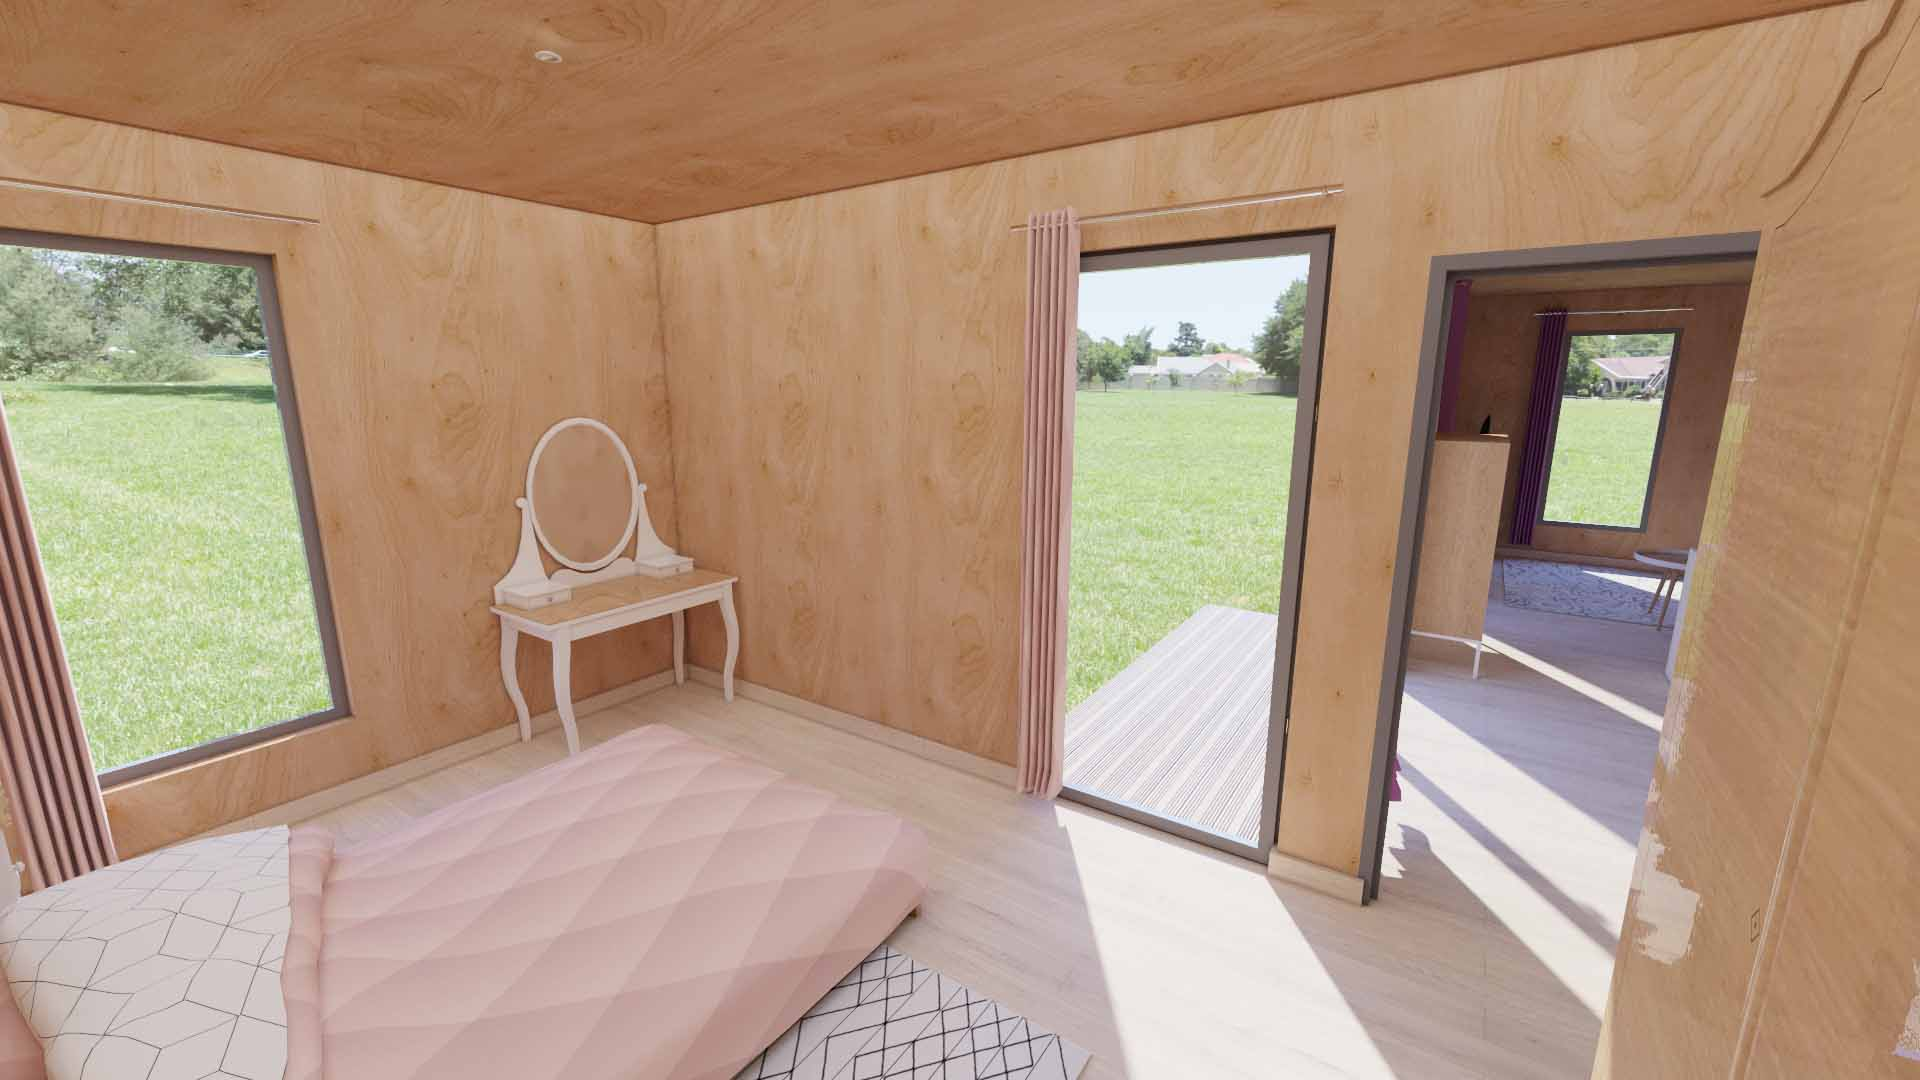 Chambre d'un studio de jardin EdenCube